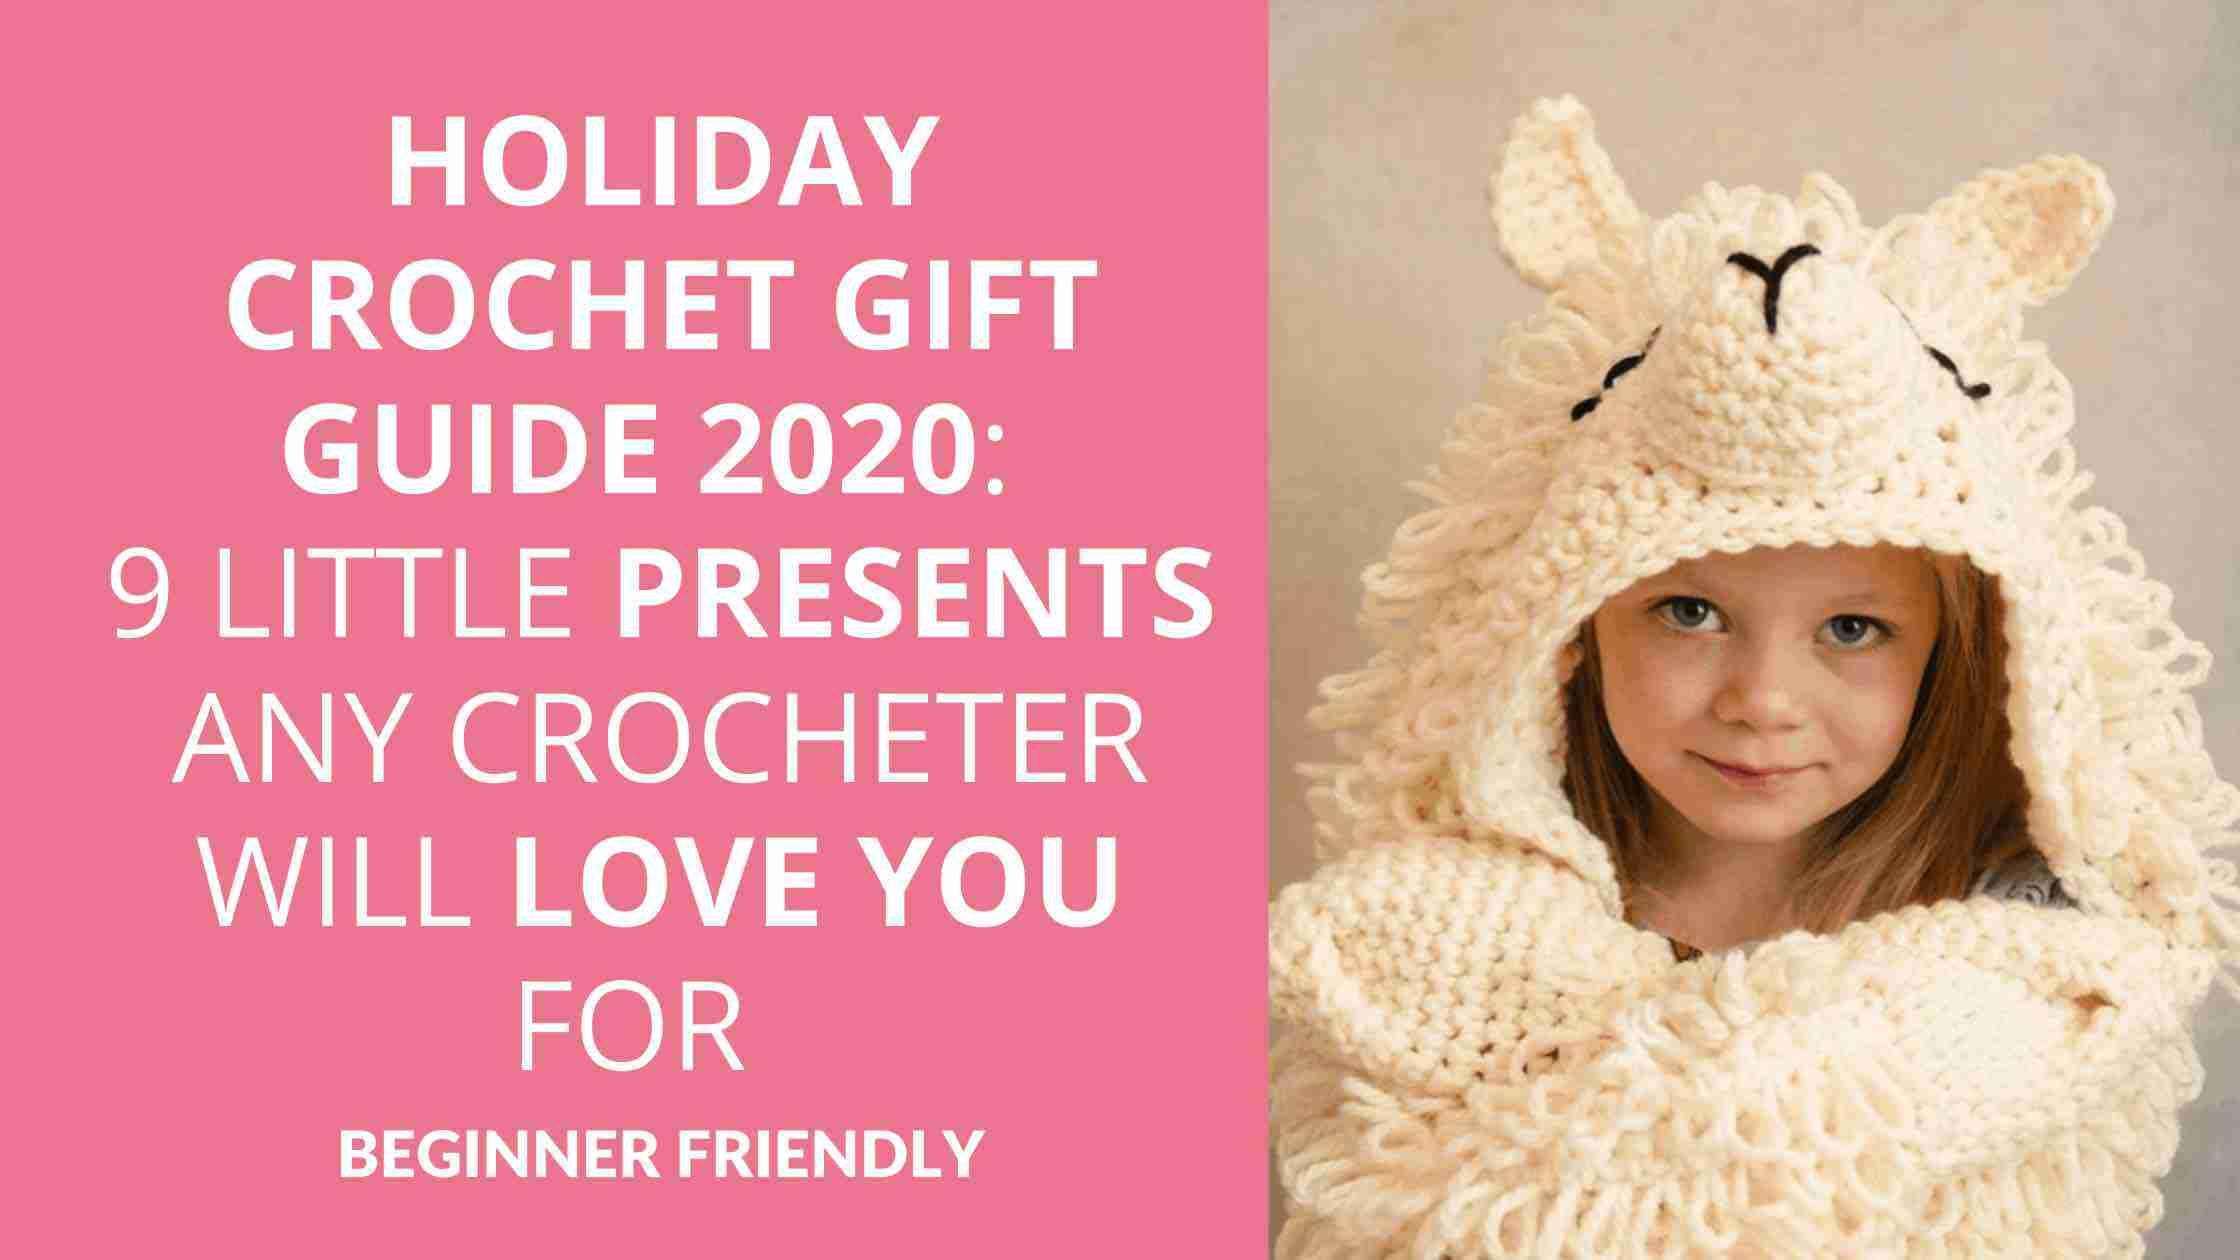 Holiday Crochet Gift Guide 2020 9 Little Presents Any Crocheter Will Love You For Start Crochet